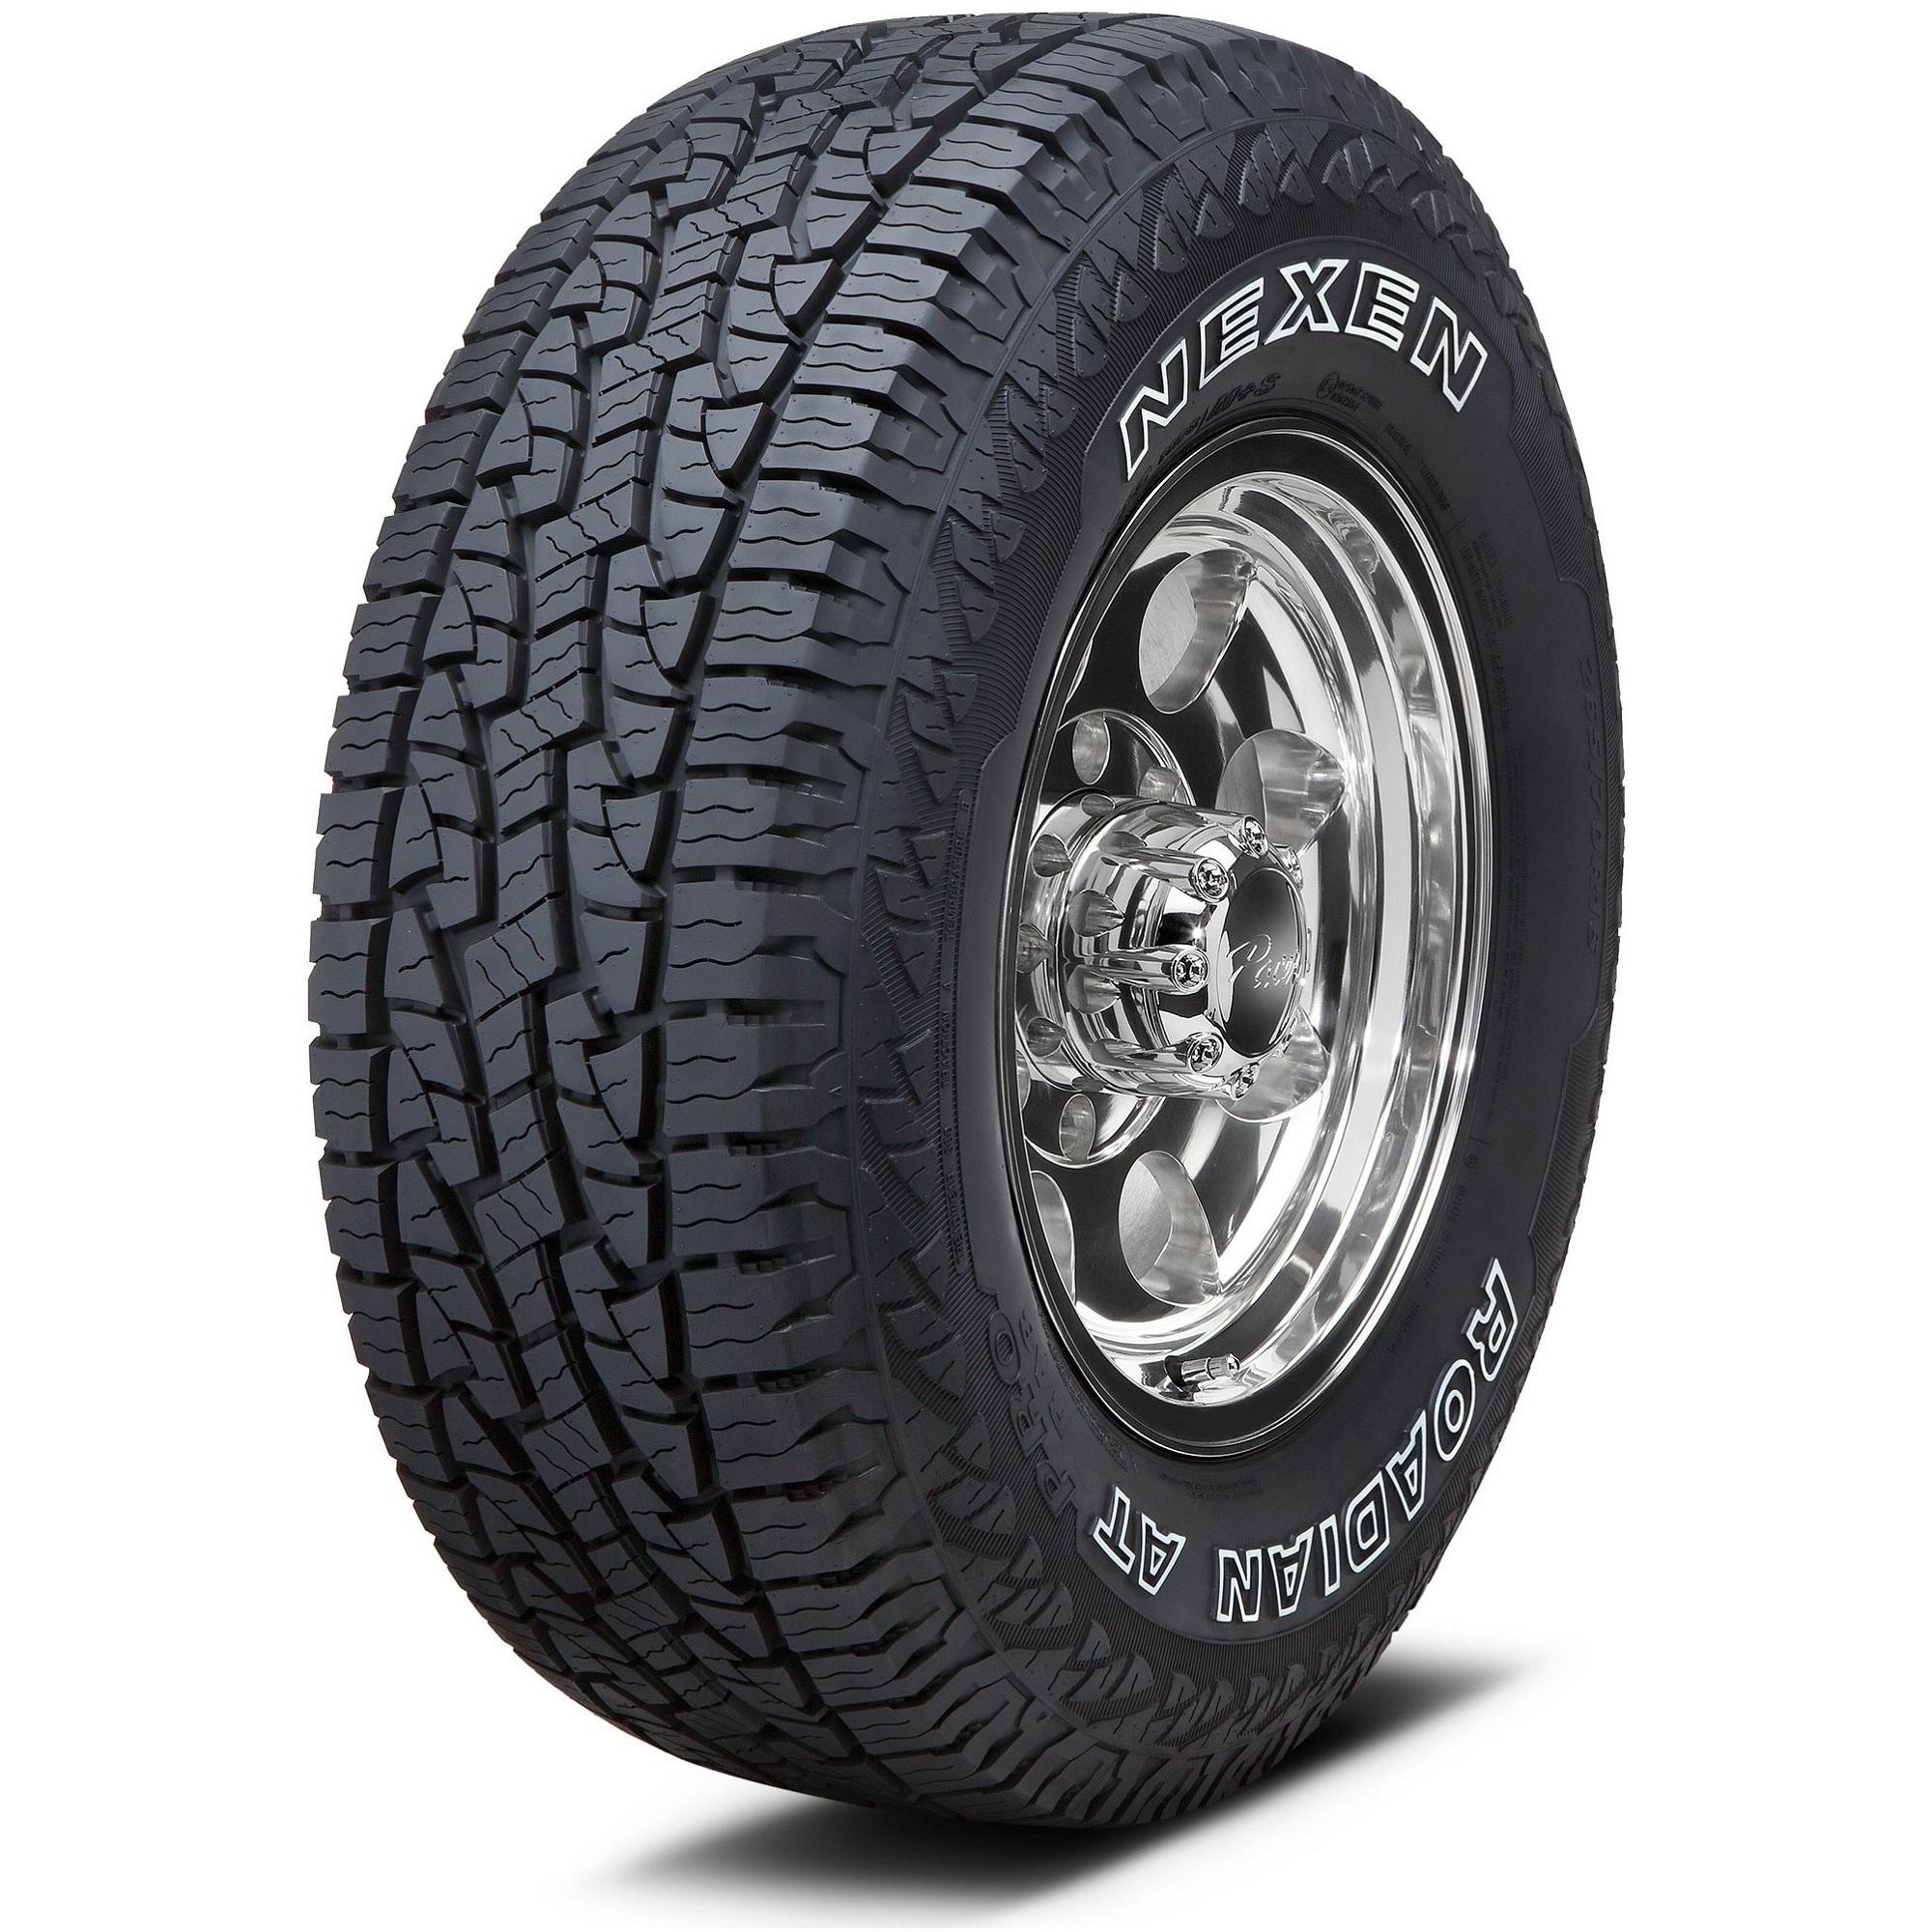 Nexen Roadian AT Pro RA8 All Terrain Tire - 245/70R17 110...